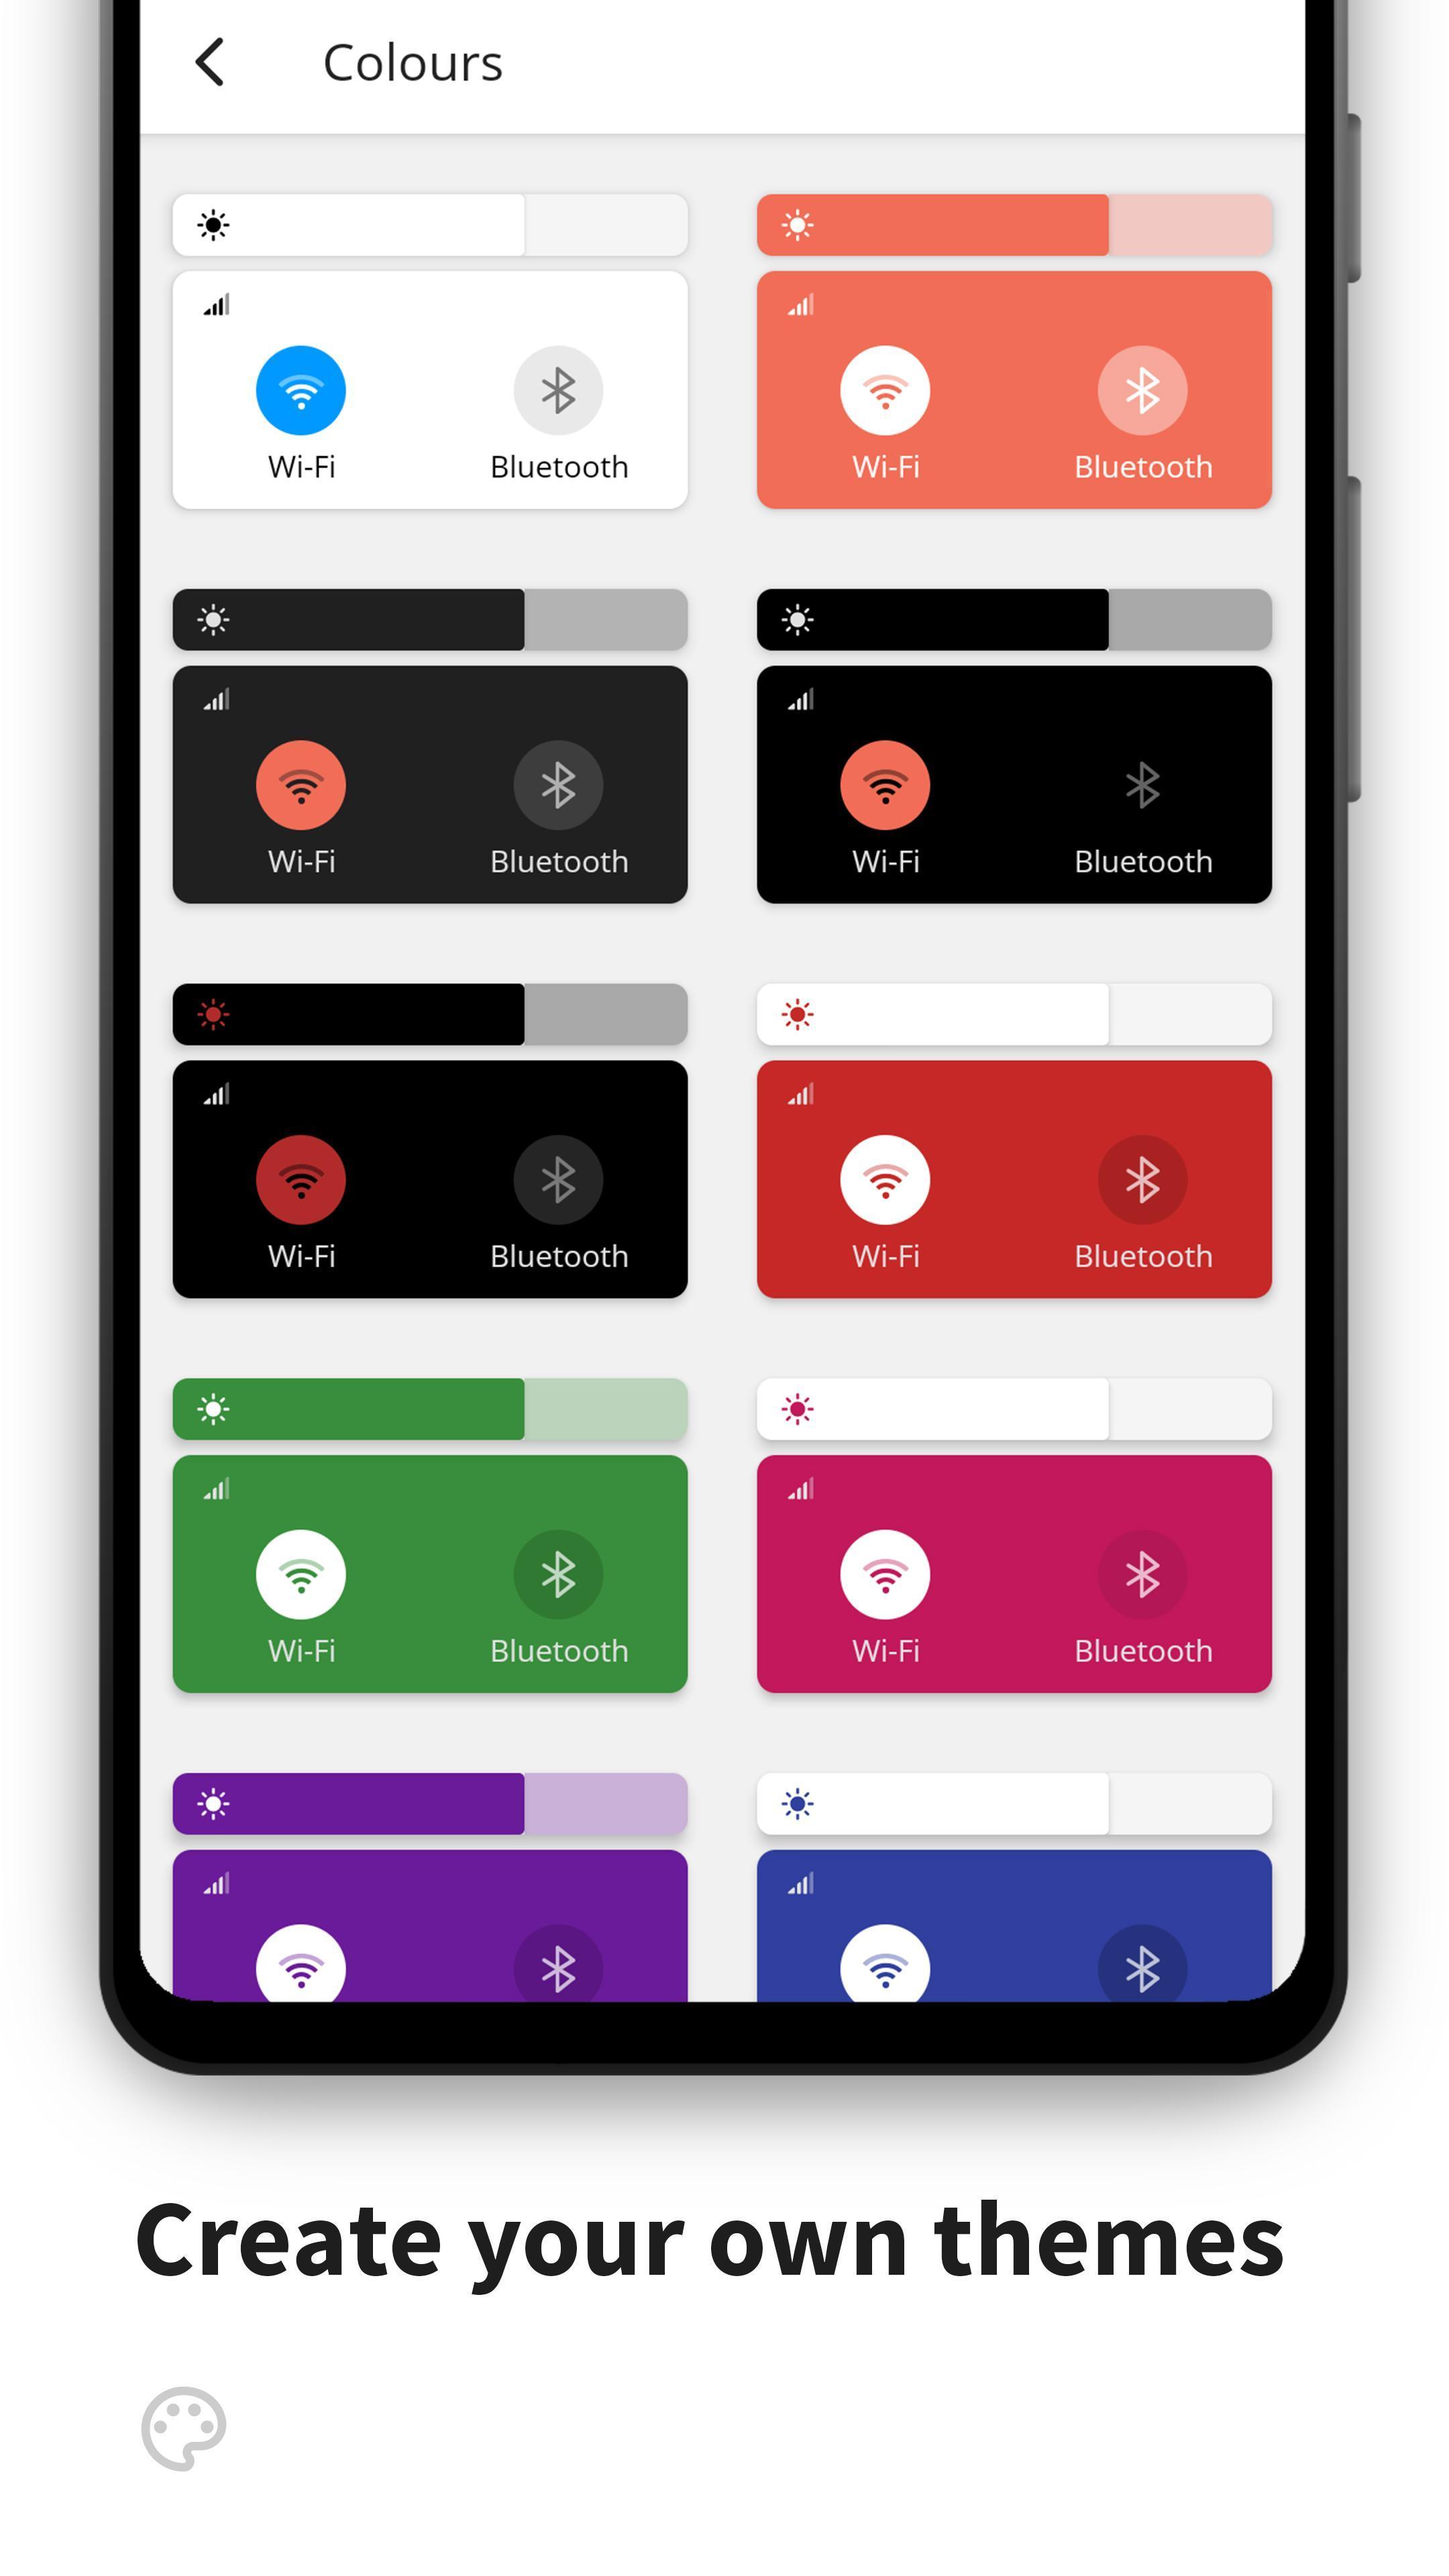 MIUI-ify Notification Shade & Quick Settings 1.7.0 Screenshot 13